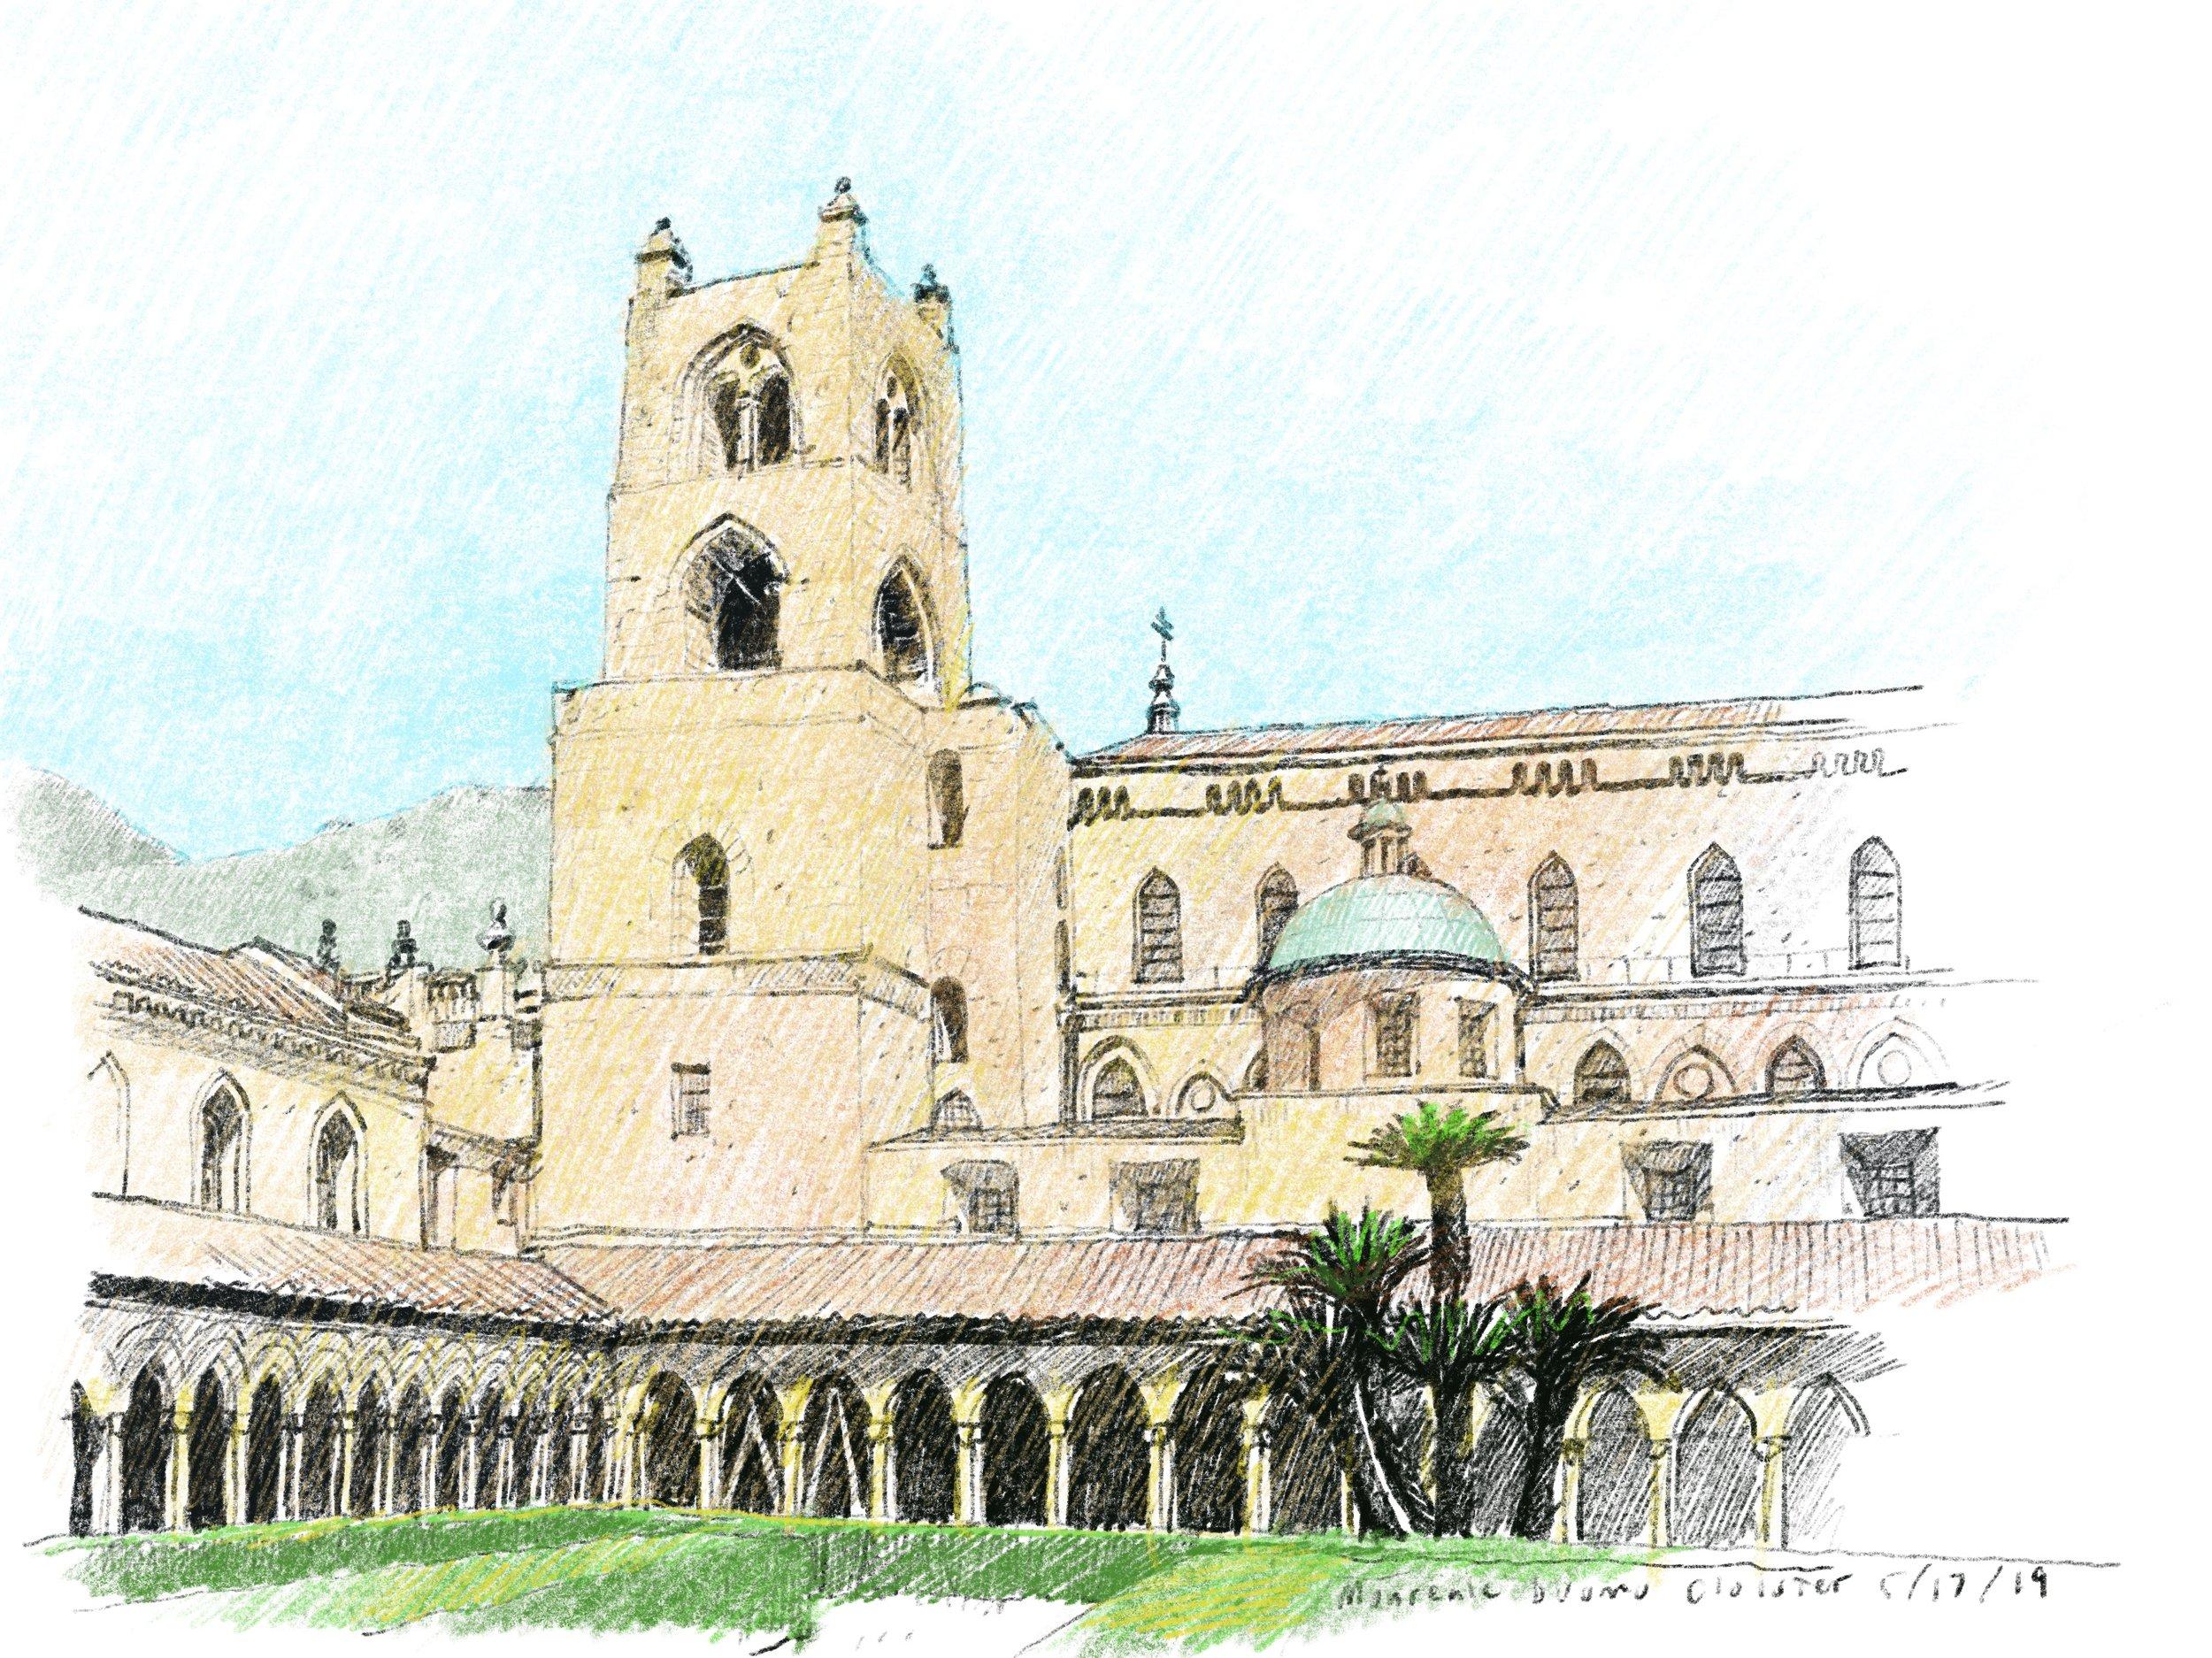 Duomo di Monreale, Sicily.  Procreate software on an iPad Pro.